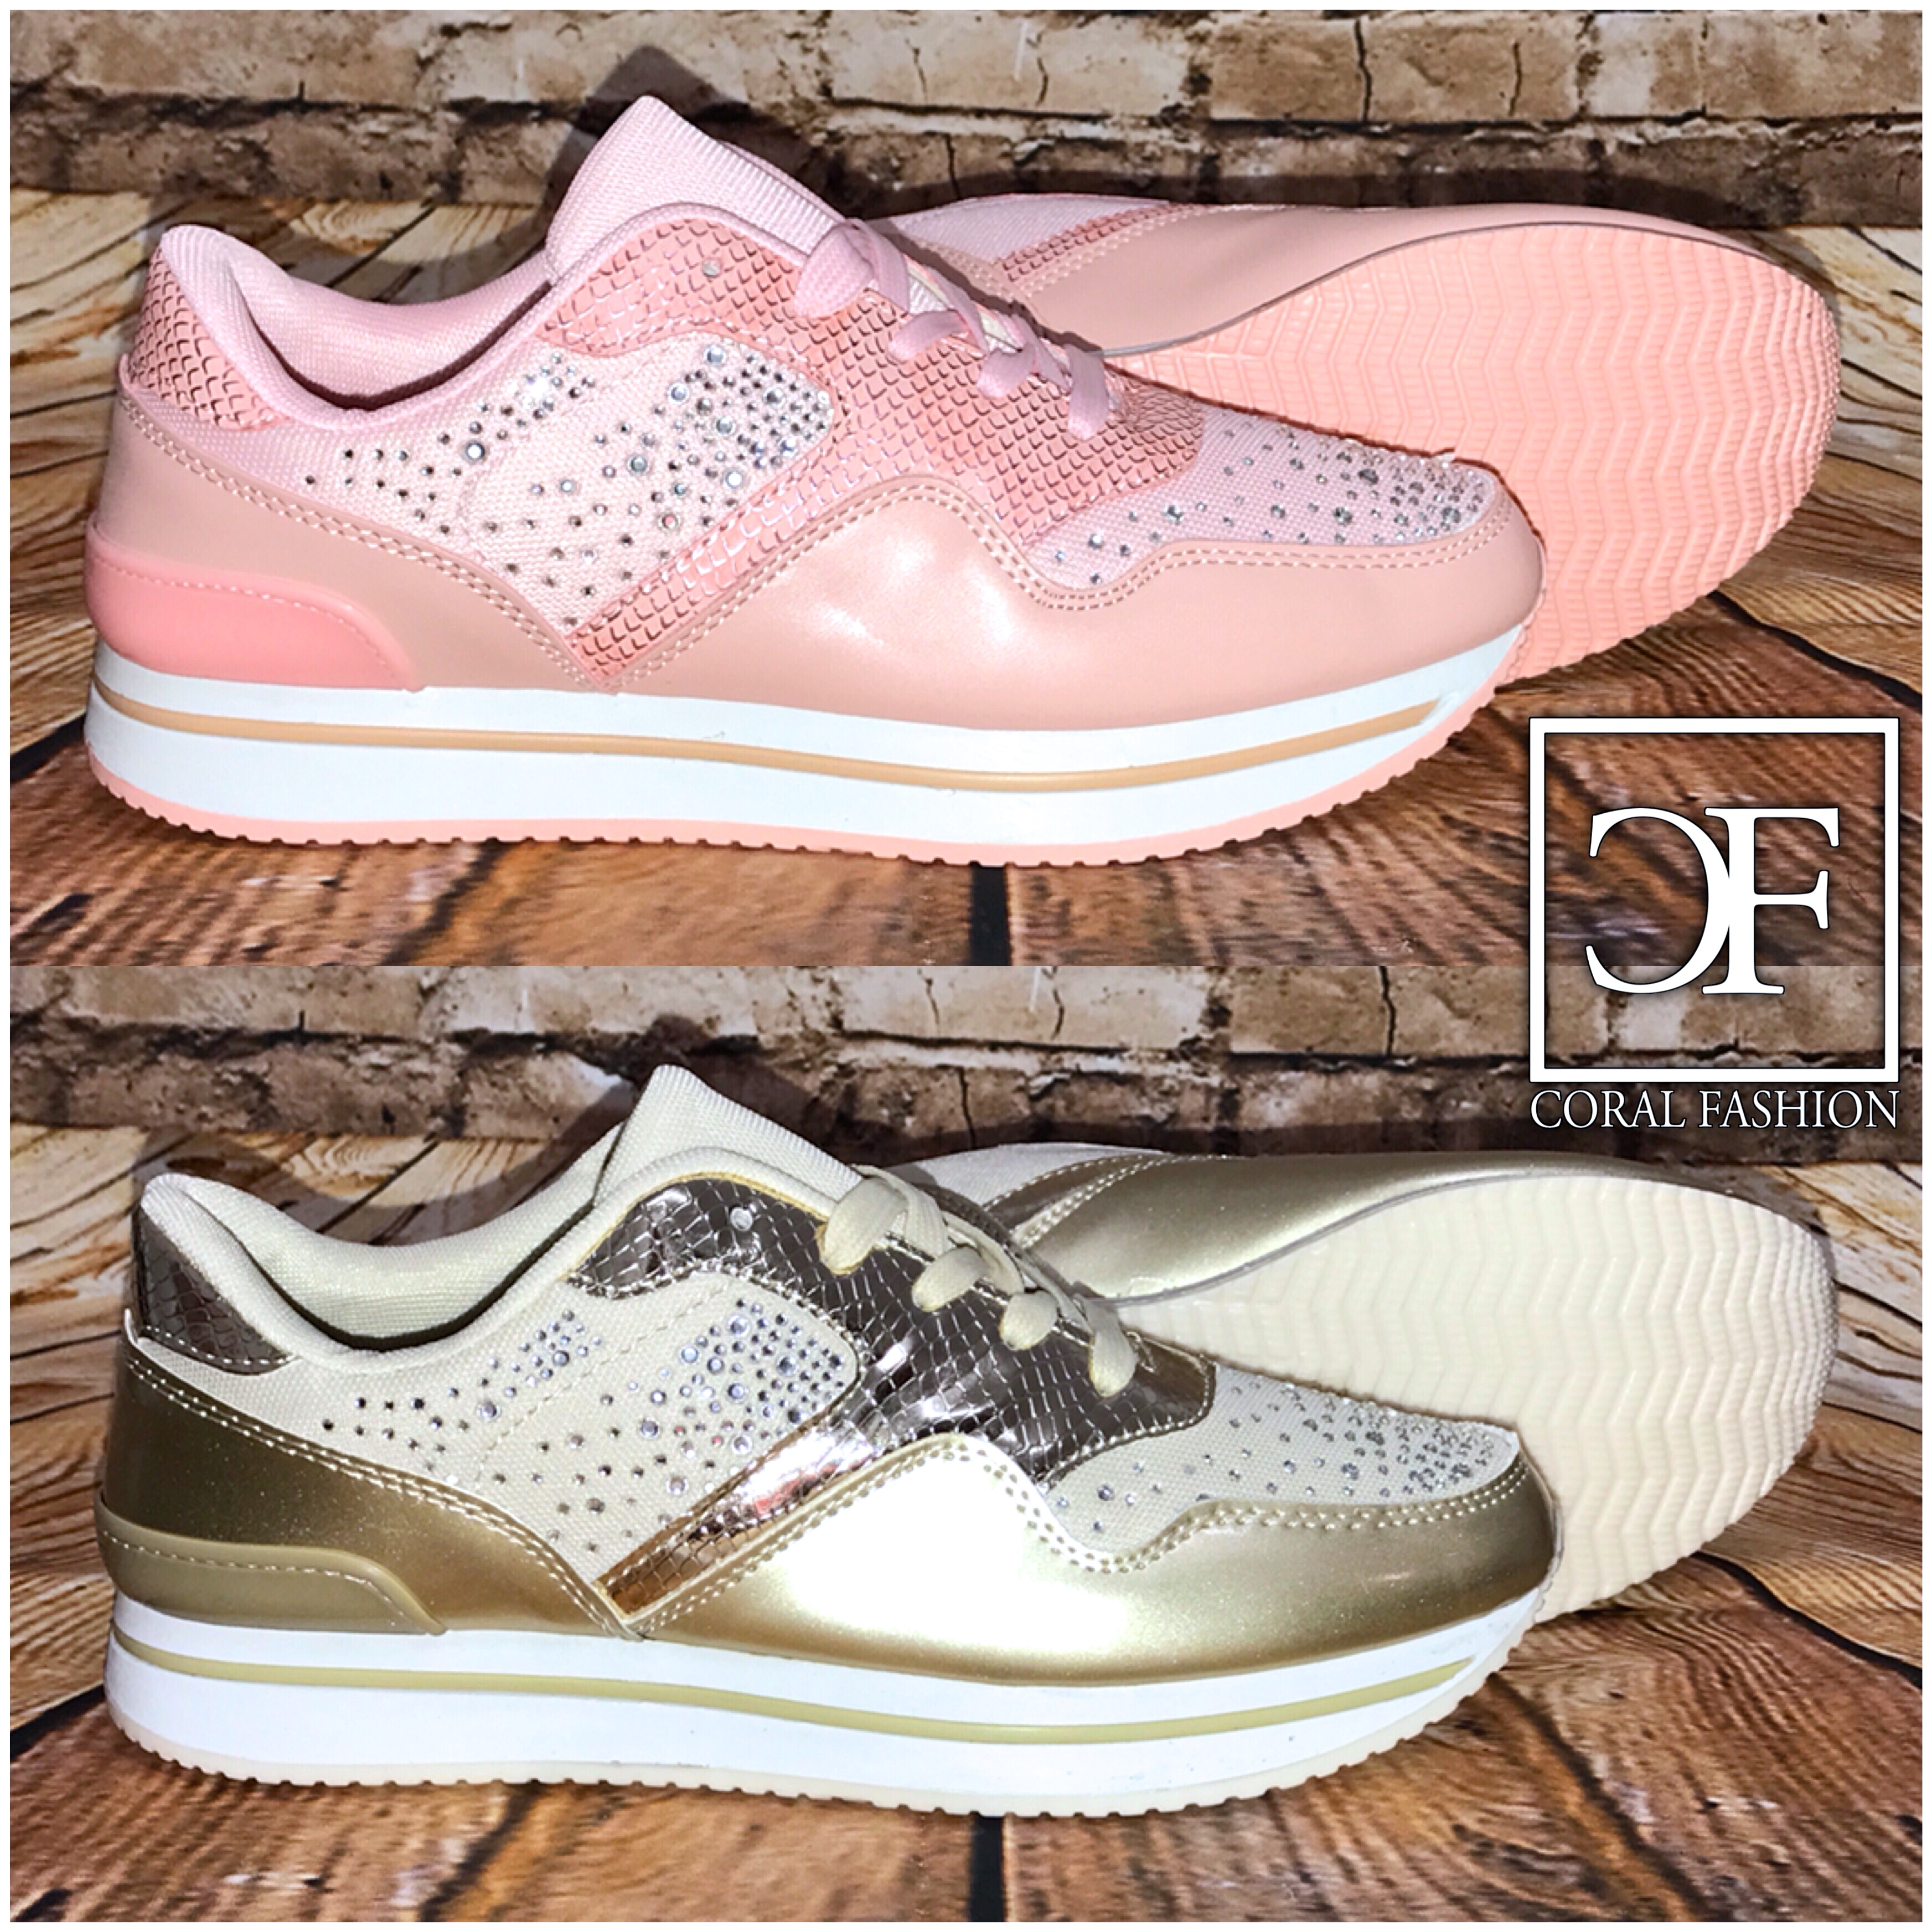 f9365be074bcb1 Coole GLITZER Fashion Sportschuhe   Sneakers mit STRASS besetzt ...